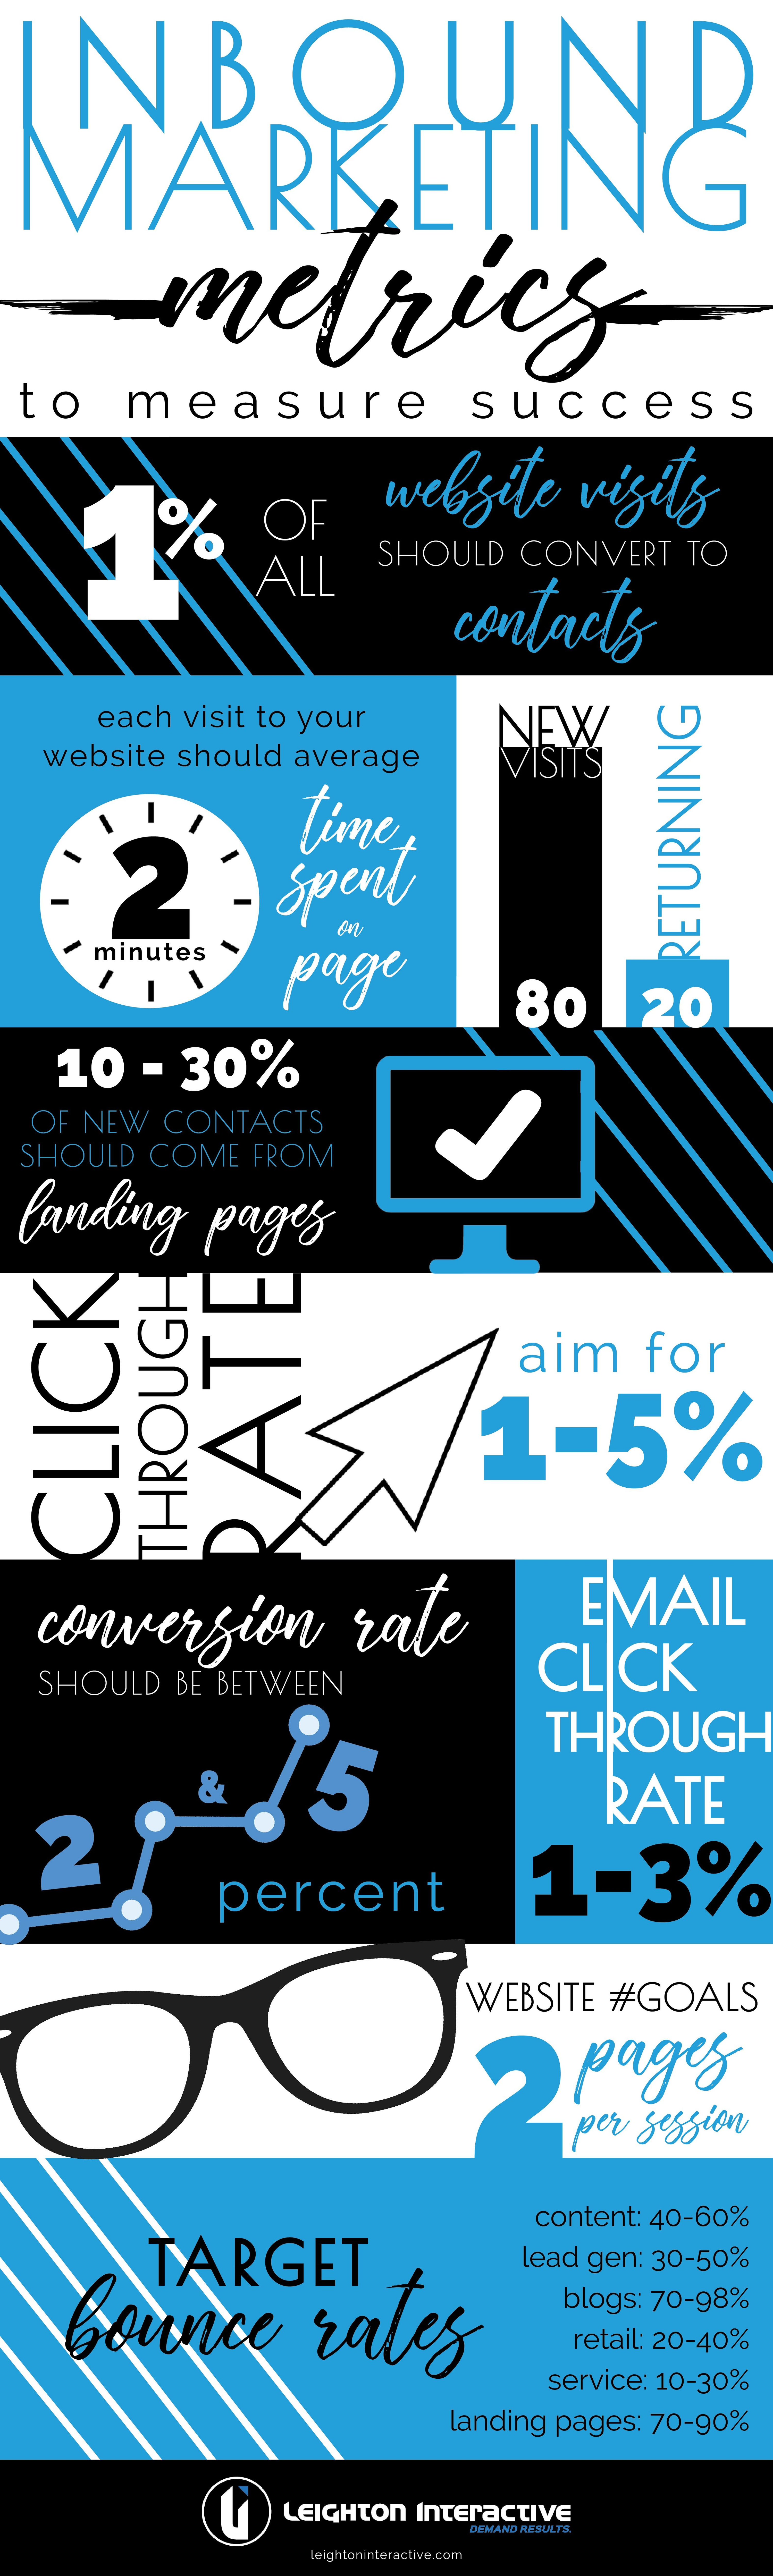 Inbound marketing metrics